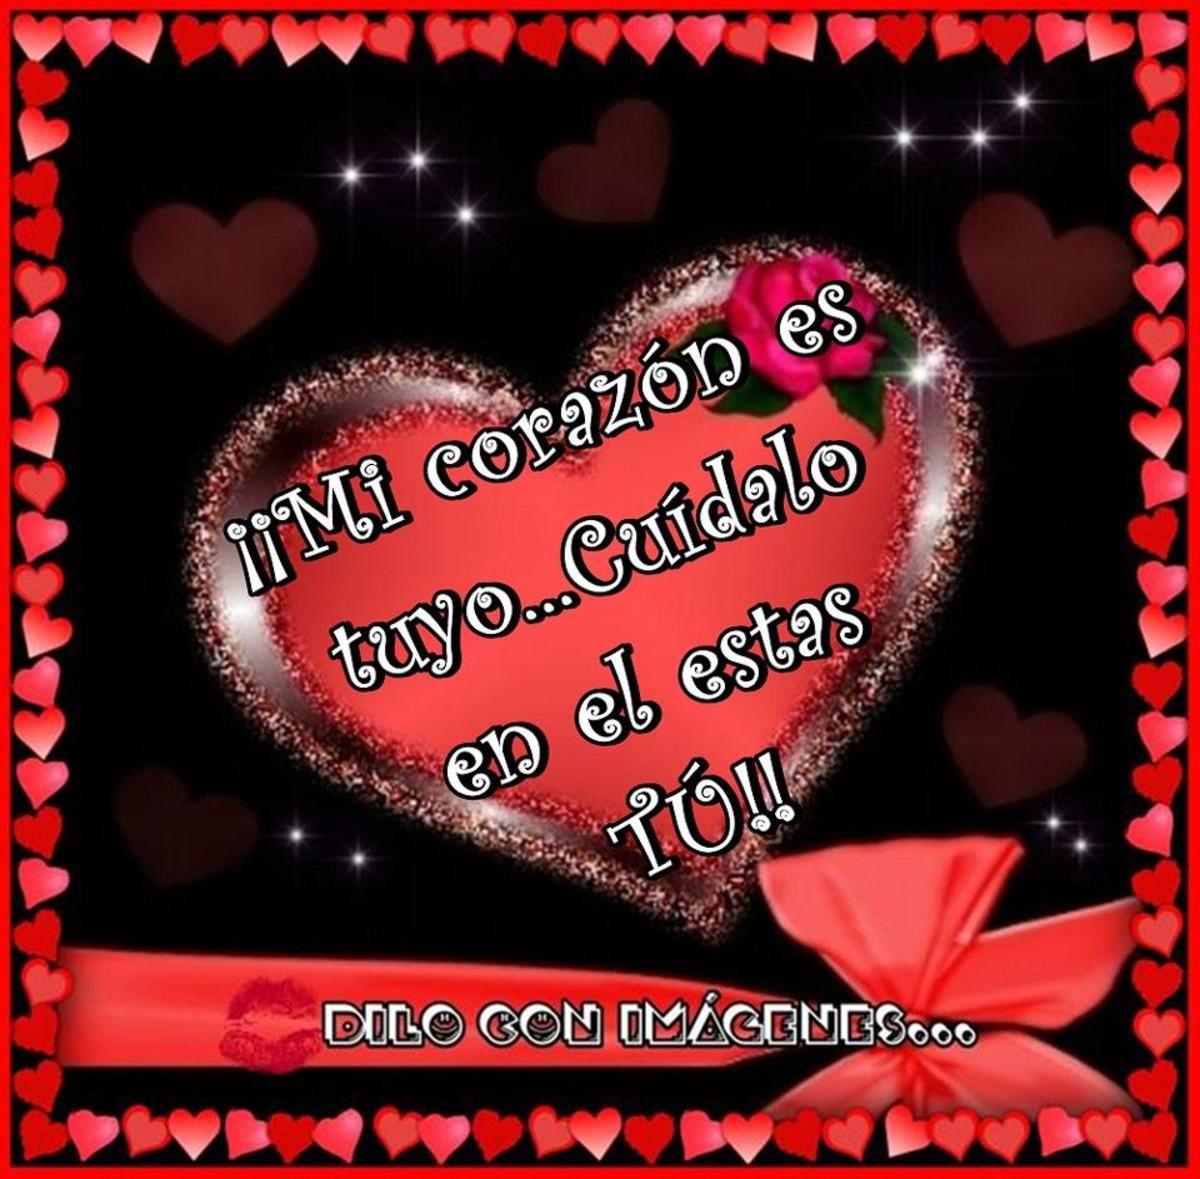 Lindas Frases De Amor 60 Bonitasimagenes Net Postales De Amor Amor Imagenes De Amor